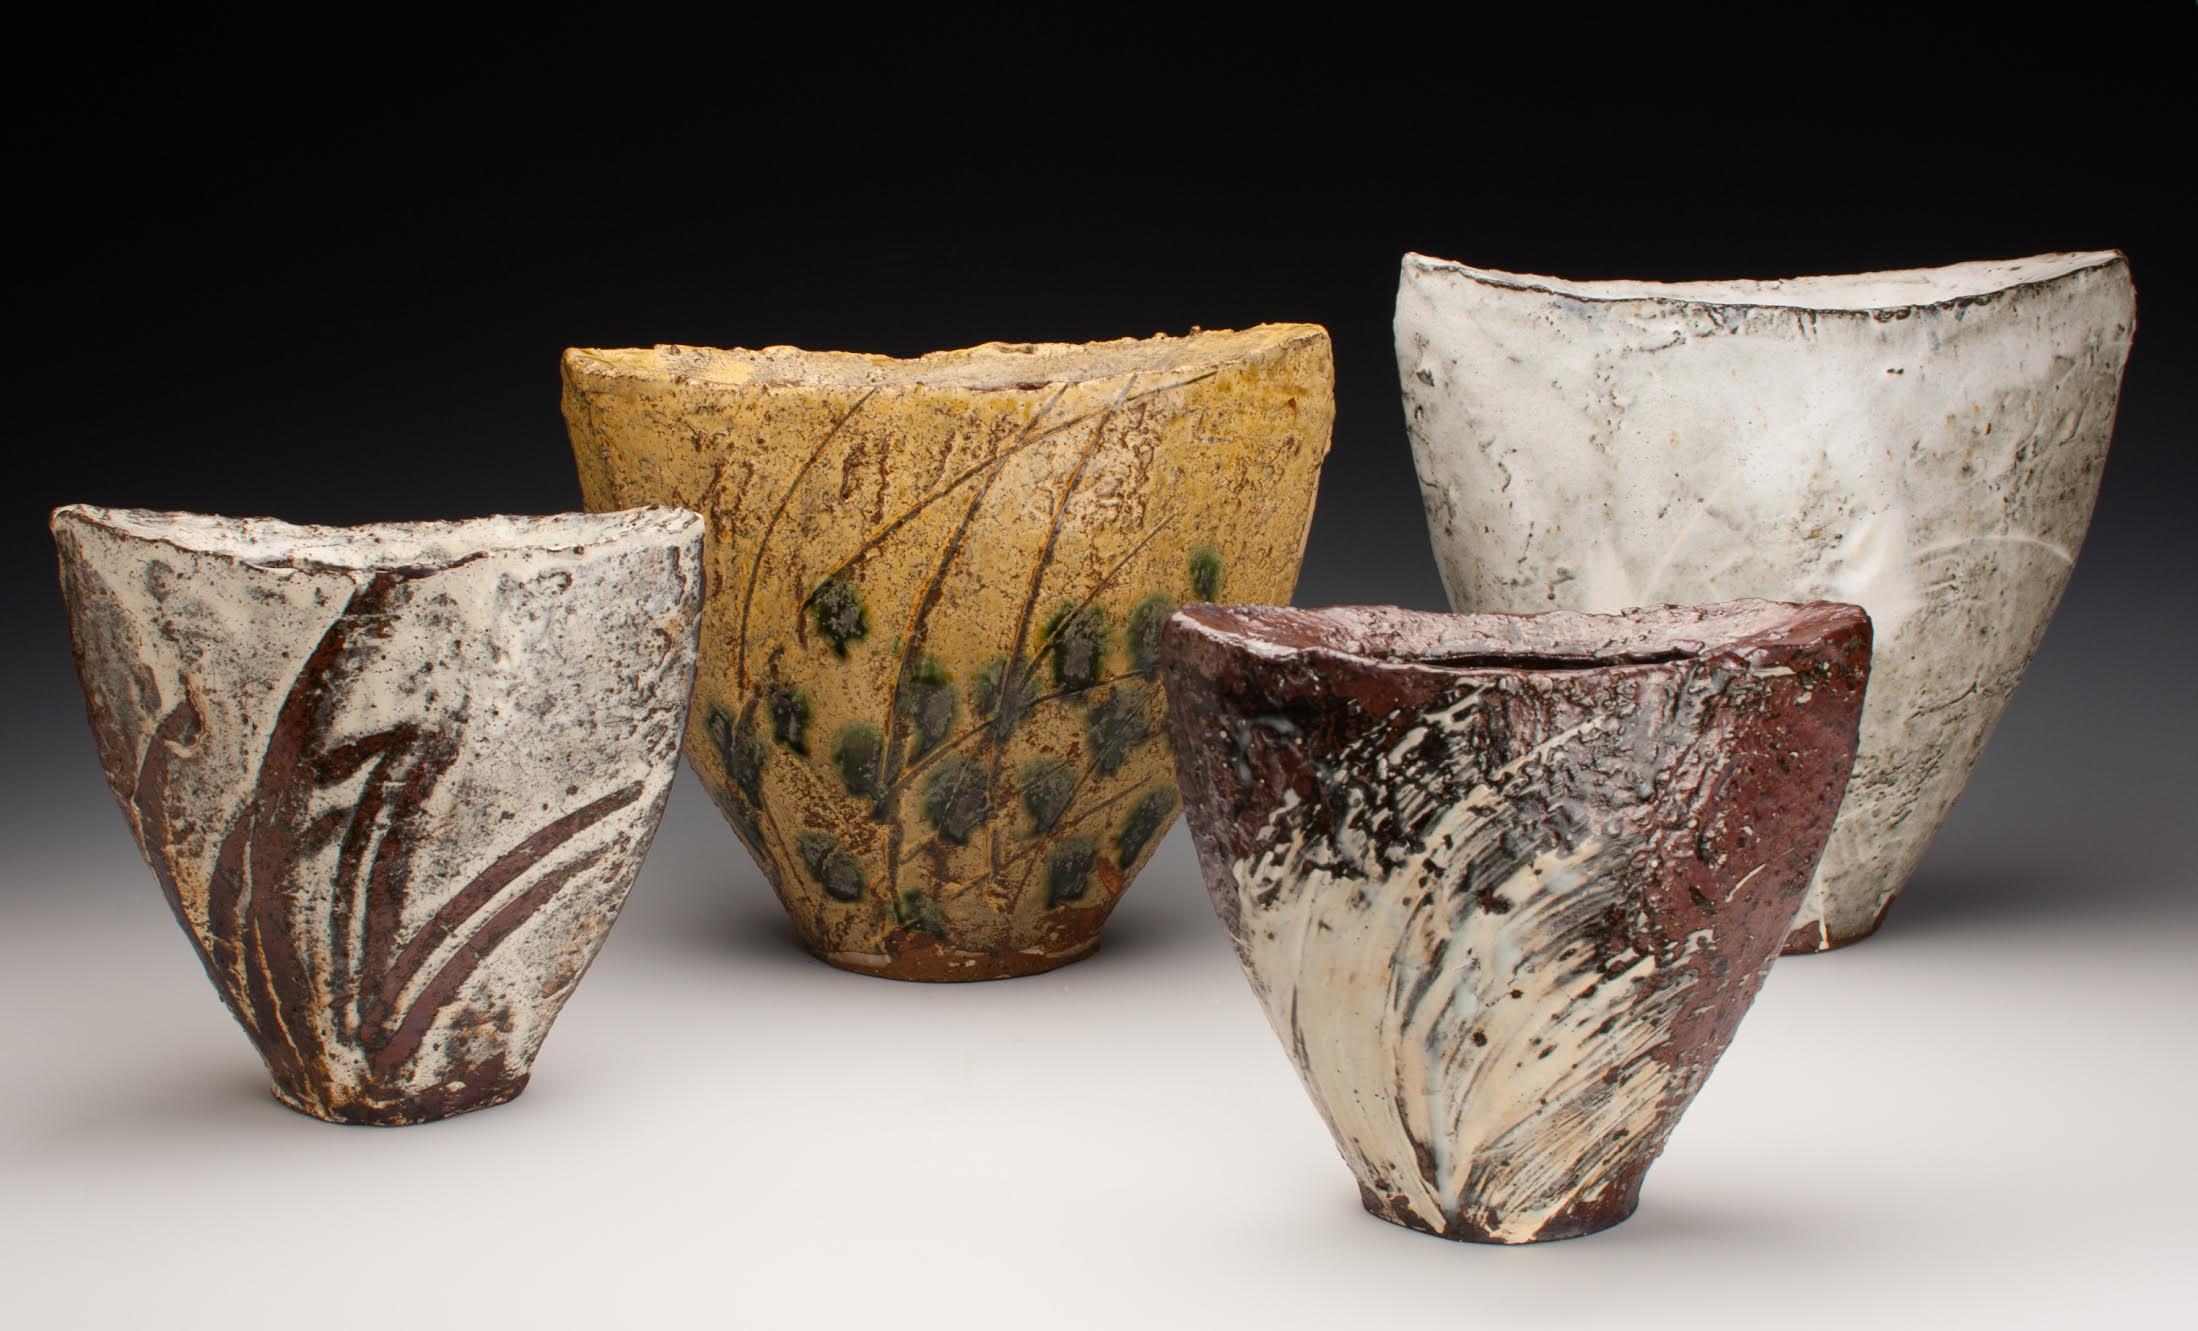 Bandana-Pottery-Vase-1.jpg